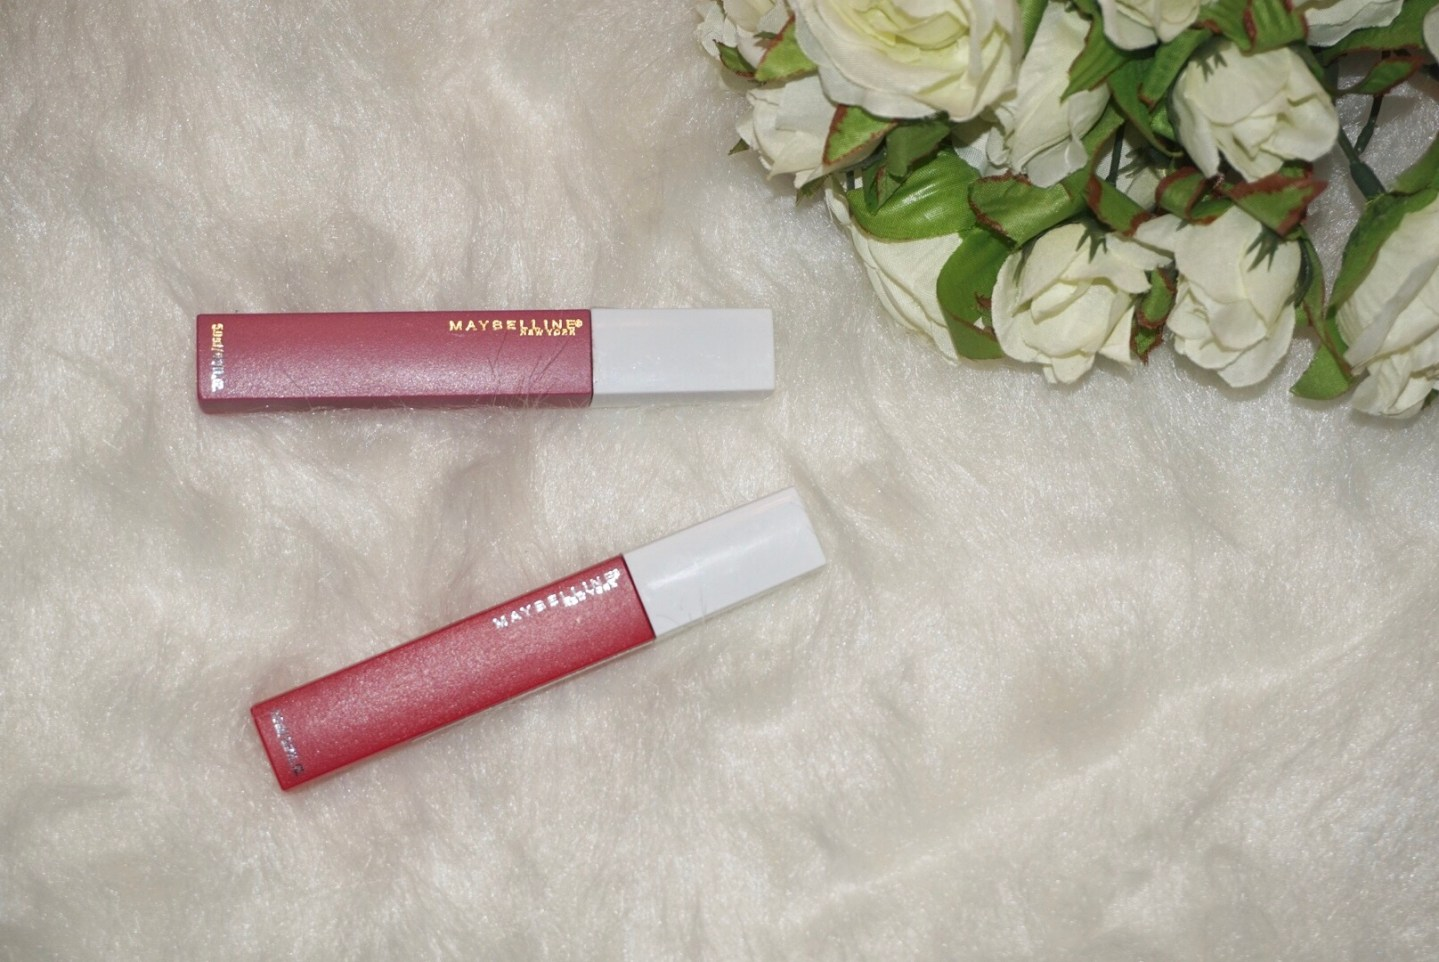 Maybelline Super Stay Matte Ink Liquid Lipstick Review